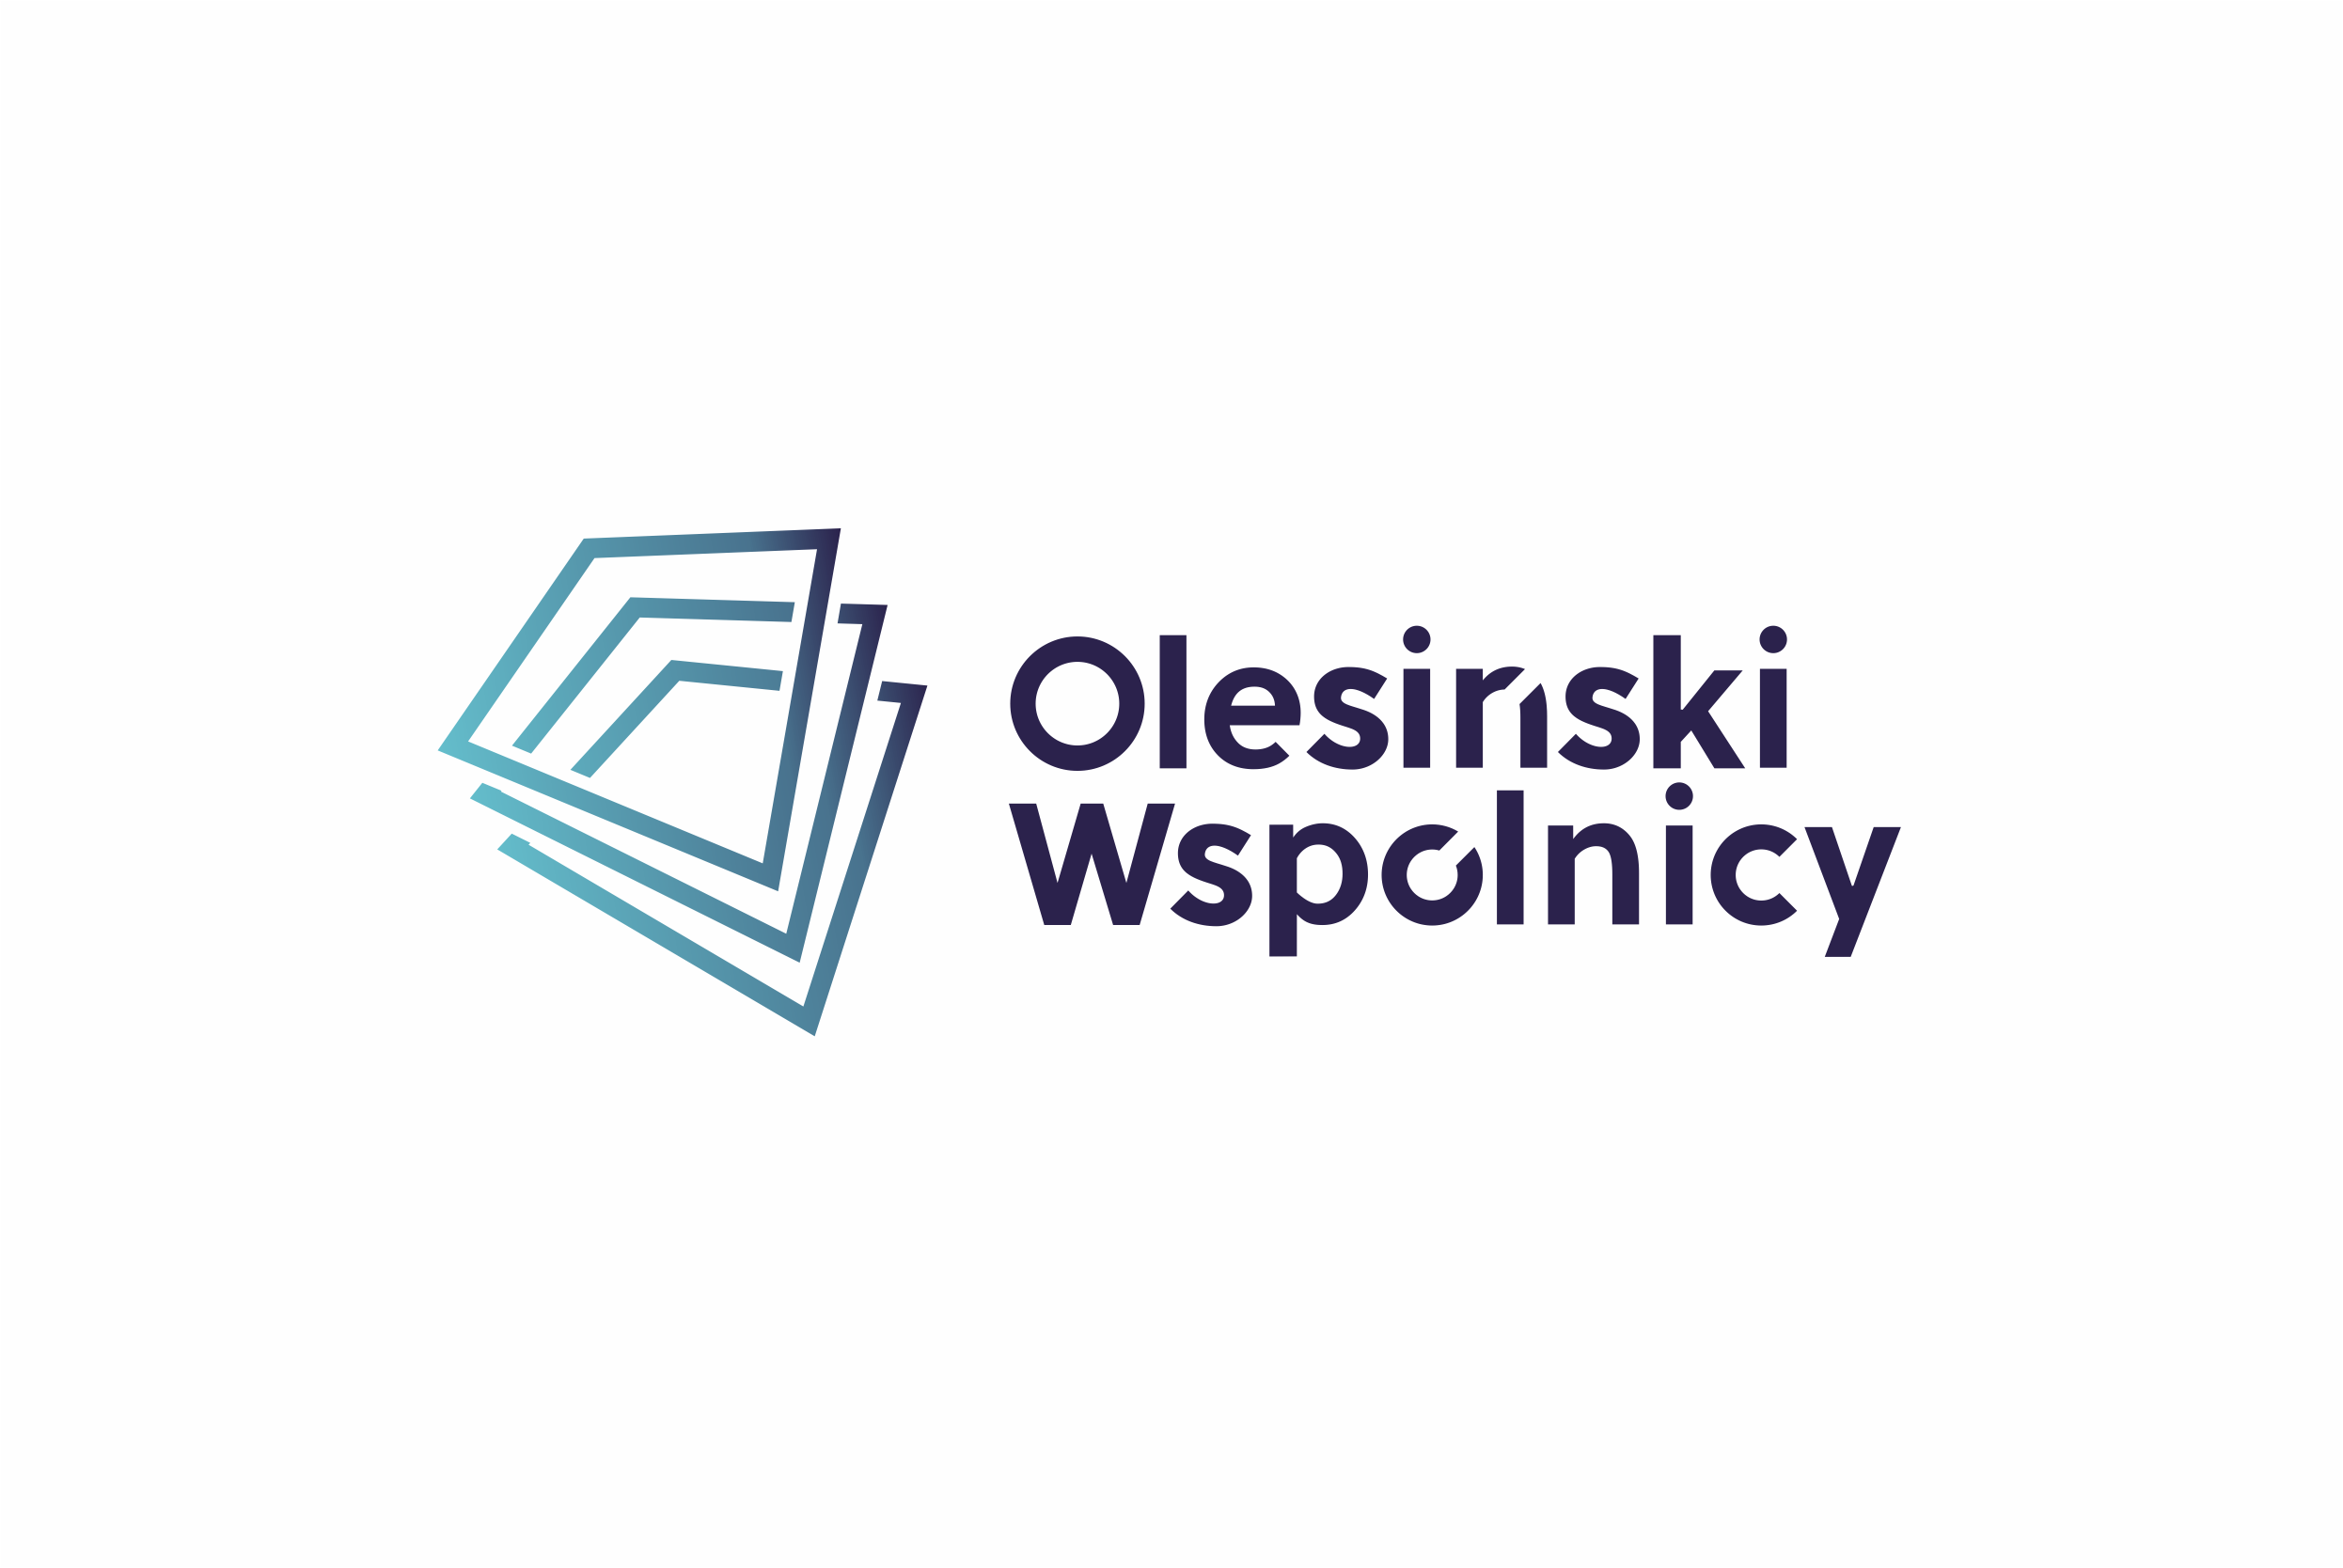 Olesinski&wspolnicy